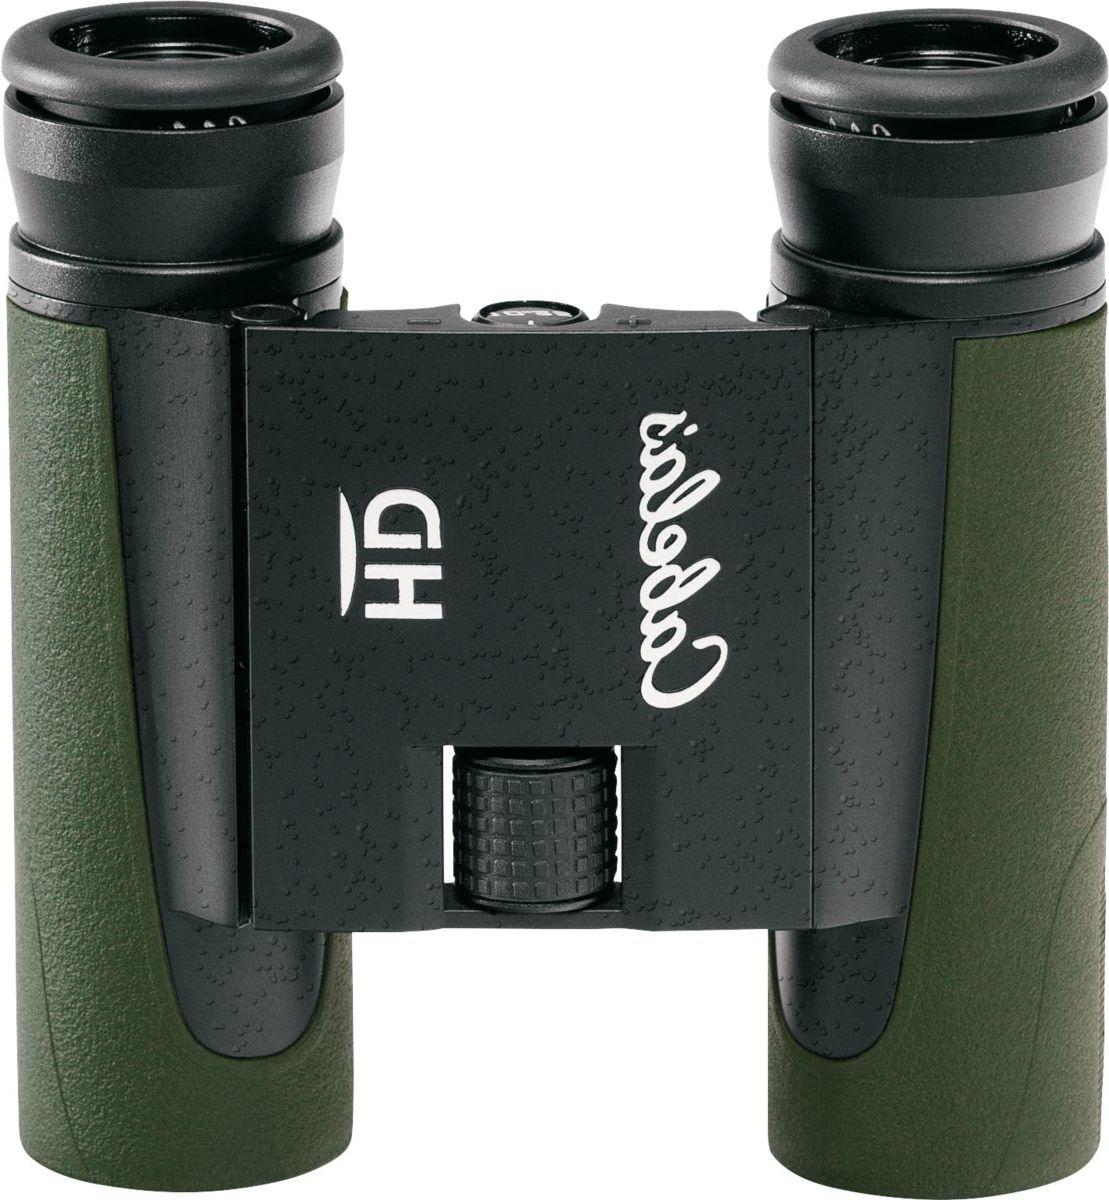 Cabela's Intensity HD Compact 12x25 Binoculars